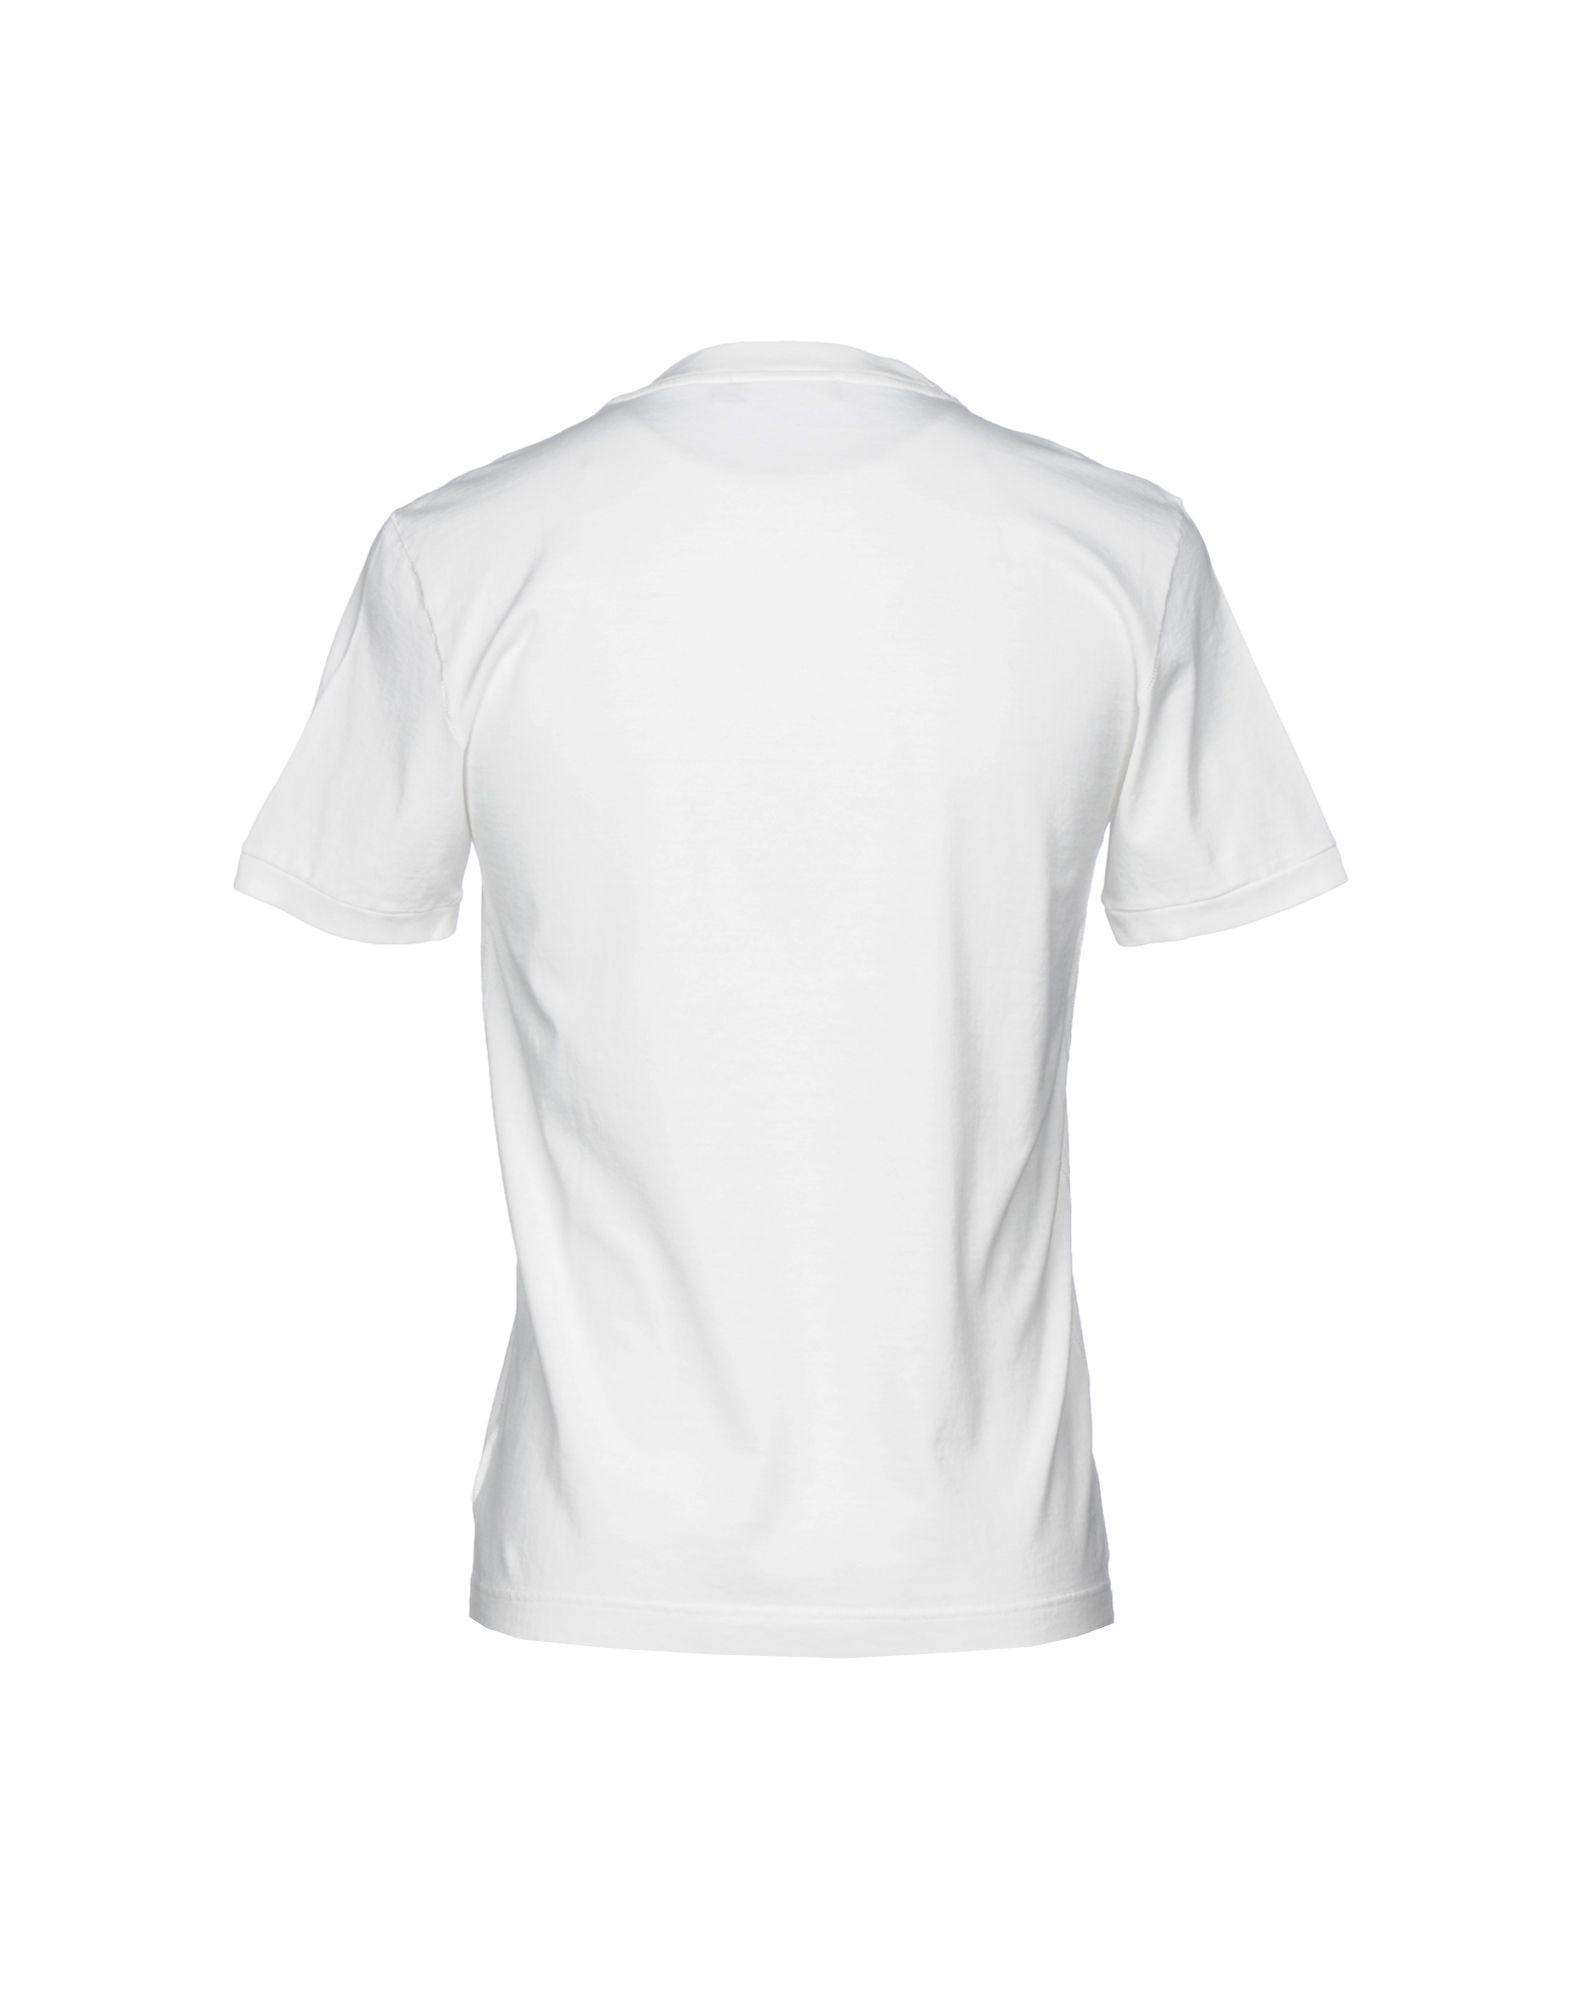 T-Shirt Dolce Uomo & Gabbana Uomo Dolce - 12170849NV edcb80